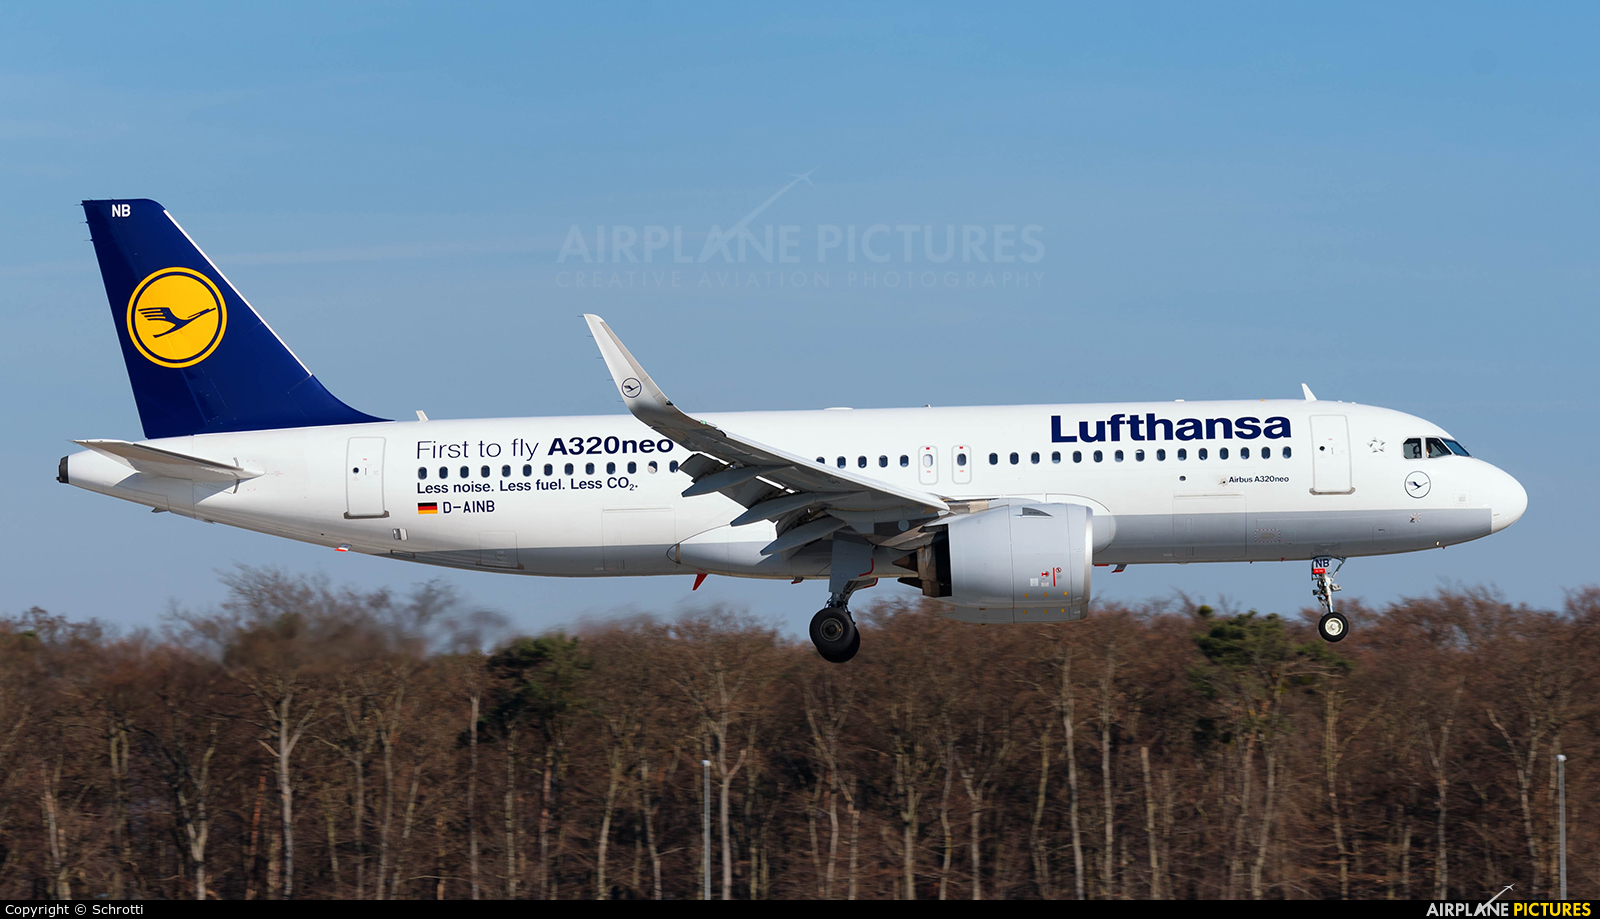 Lufthansa D-AINB aircraft at Frankfurt